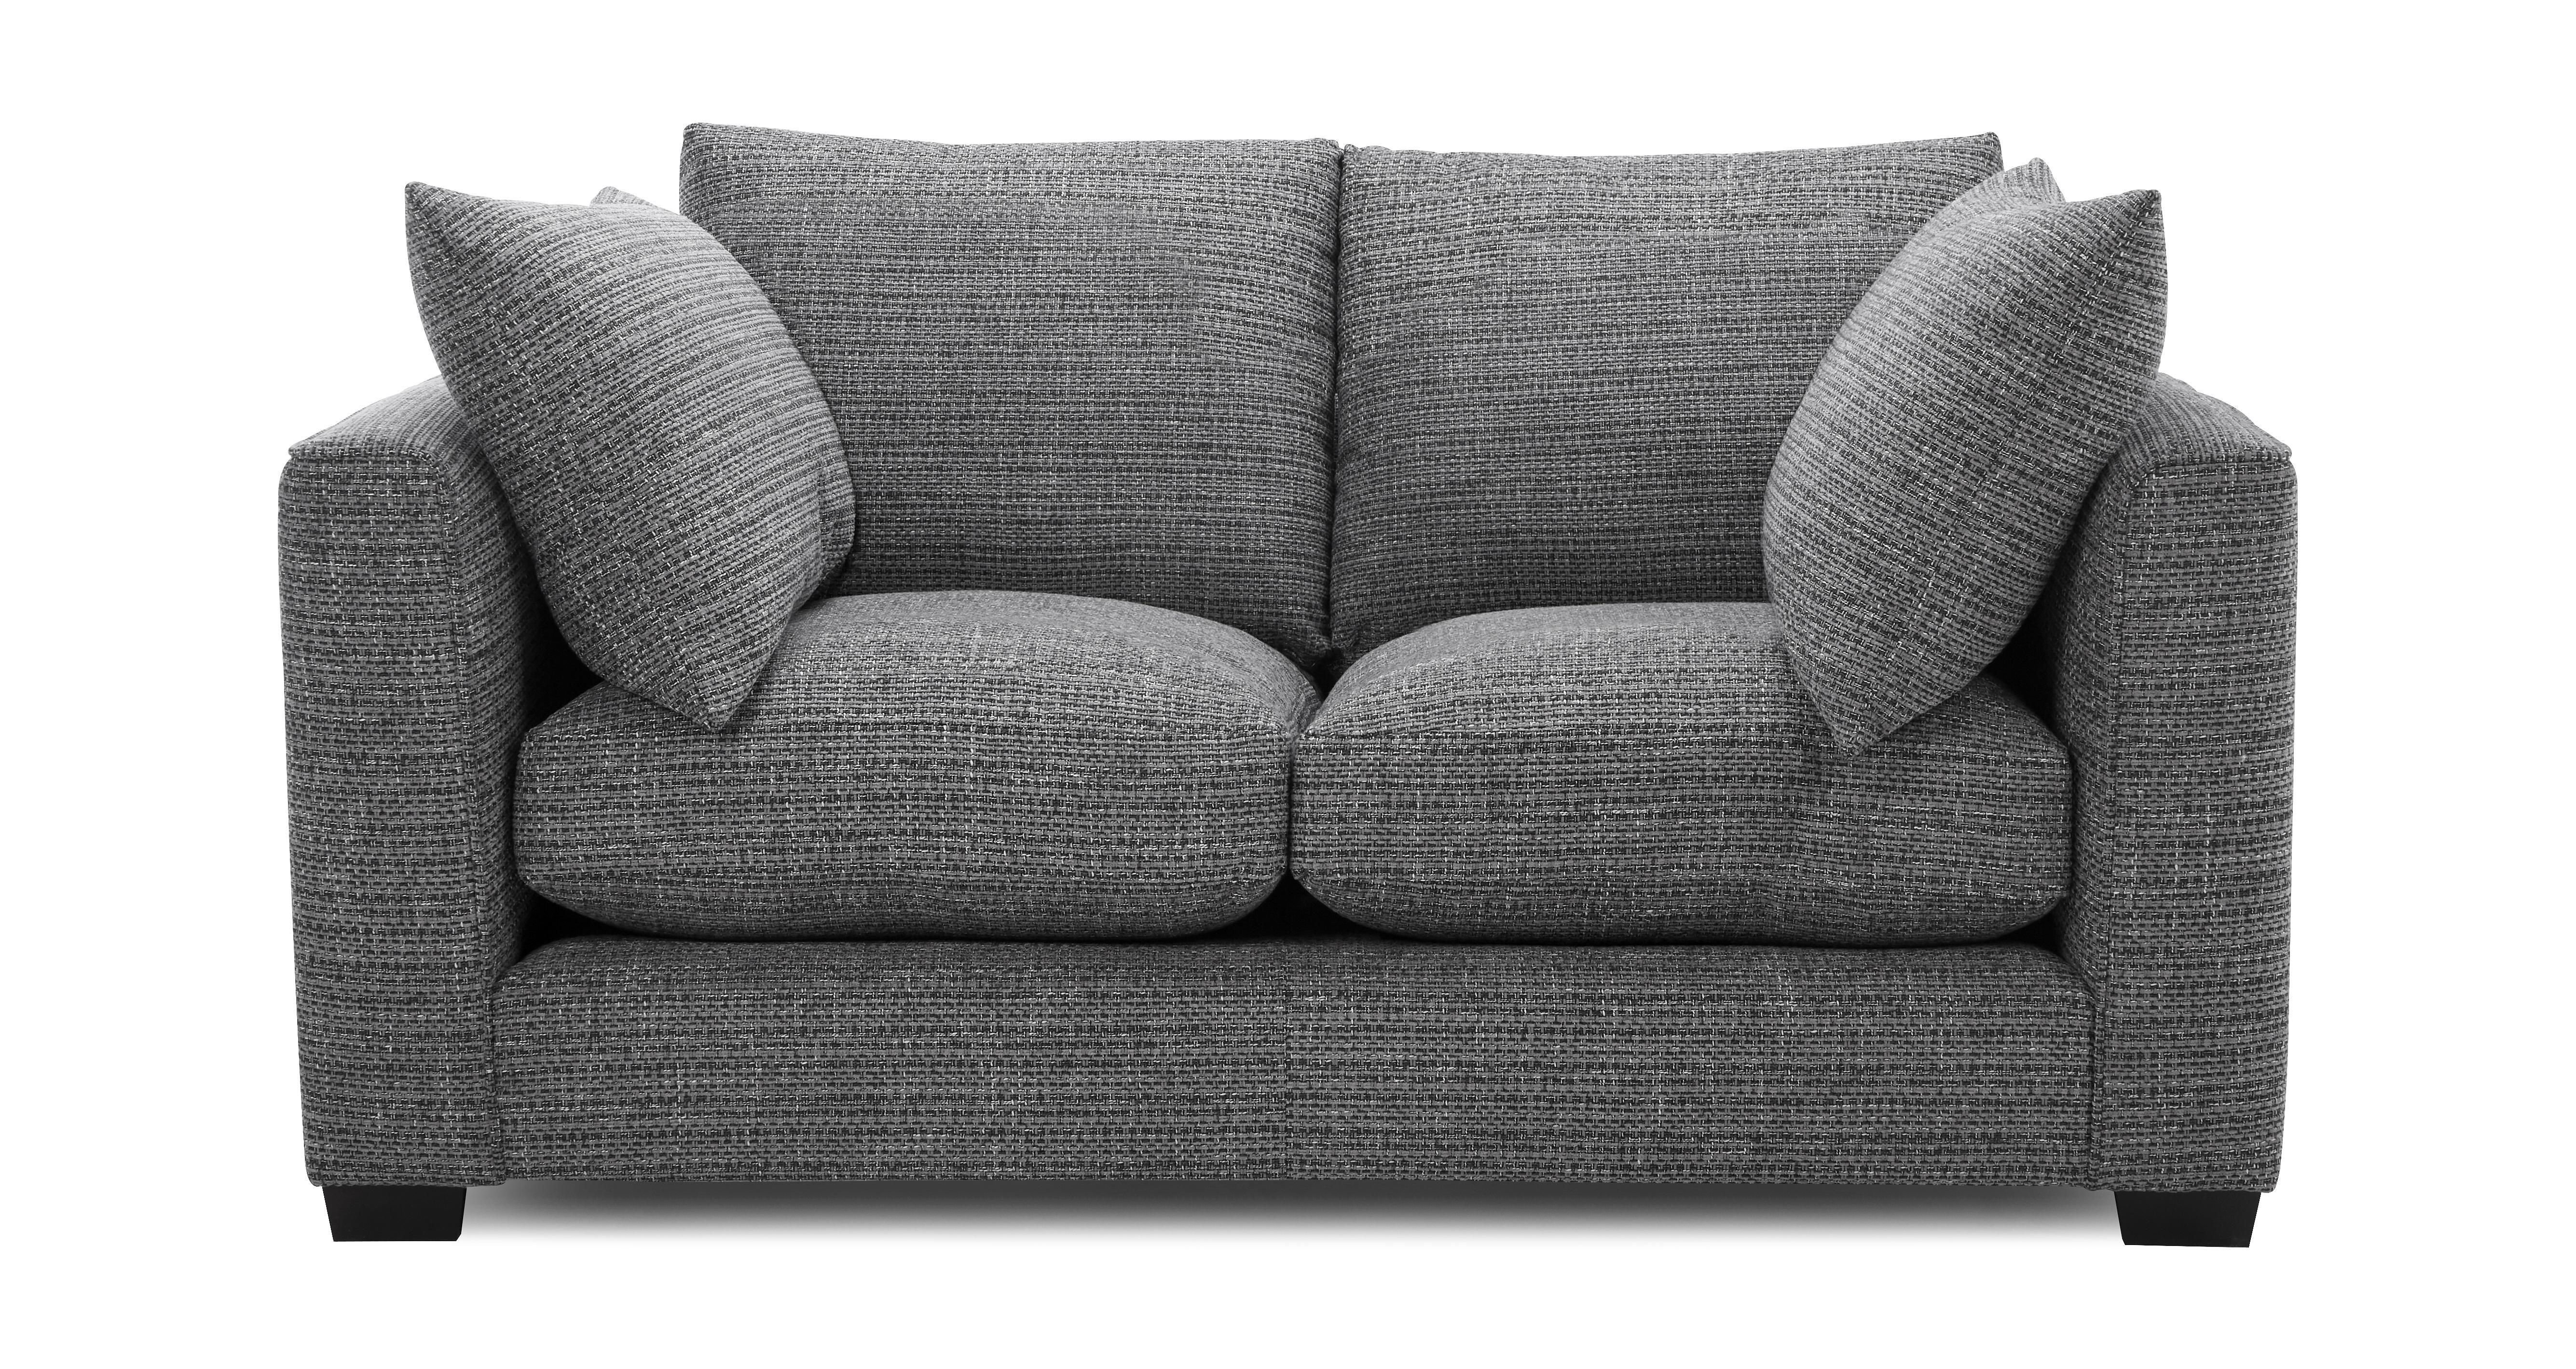 Keaton Weave Small 2 Seater Sofa Keaton Weave | DFS Ireland